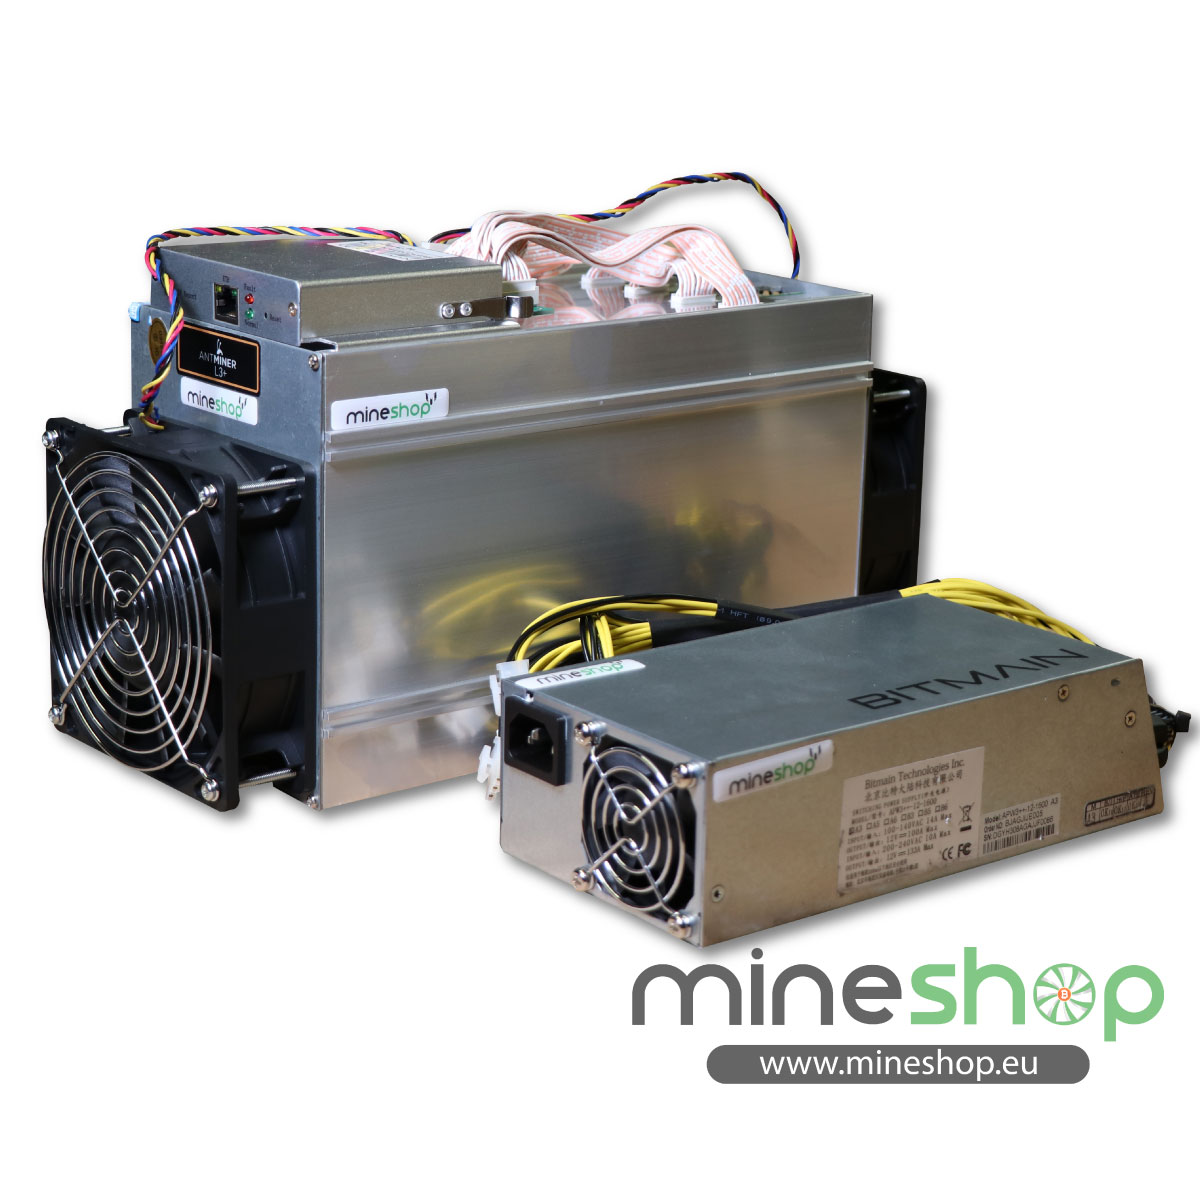 BITMAIN antminer L3+ for Litecoin – Mineshop